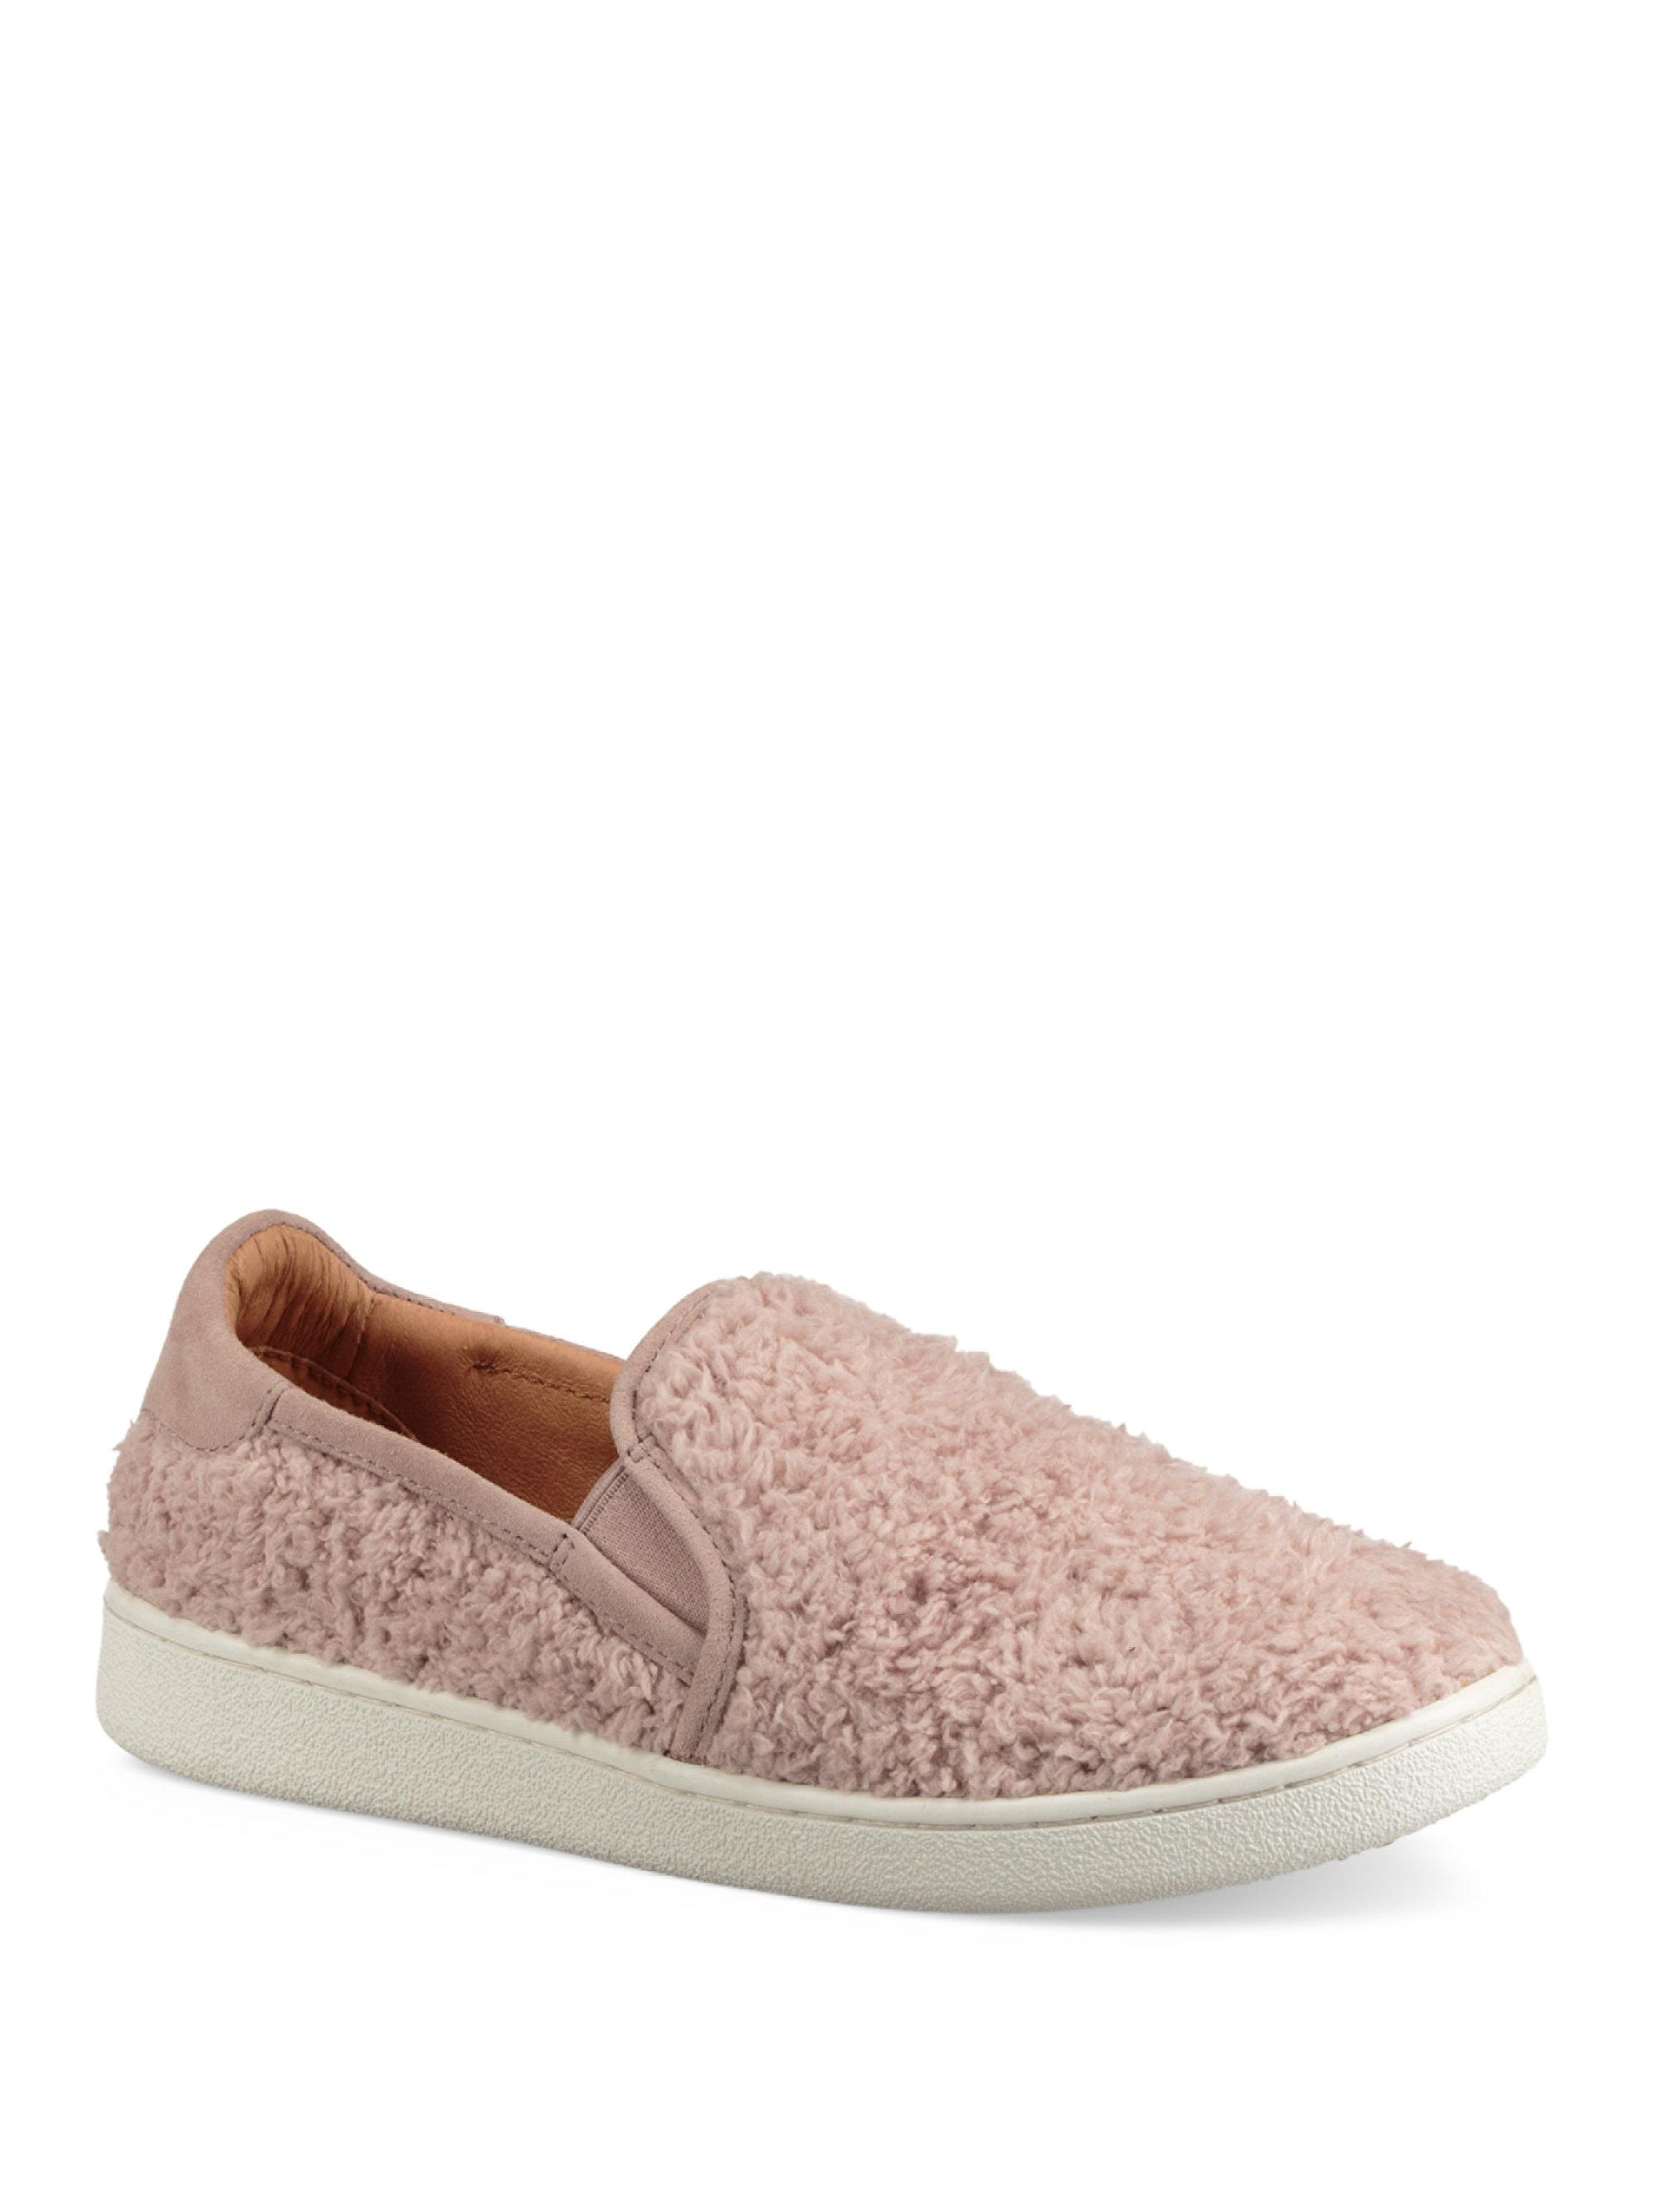 UGG Ricci Shearling Slip-On Sneakers UBry1pe71